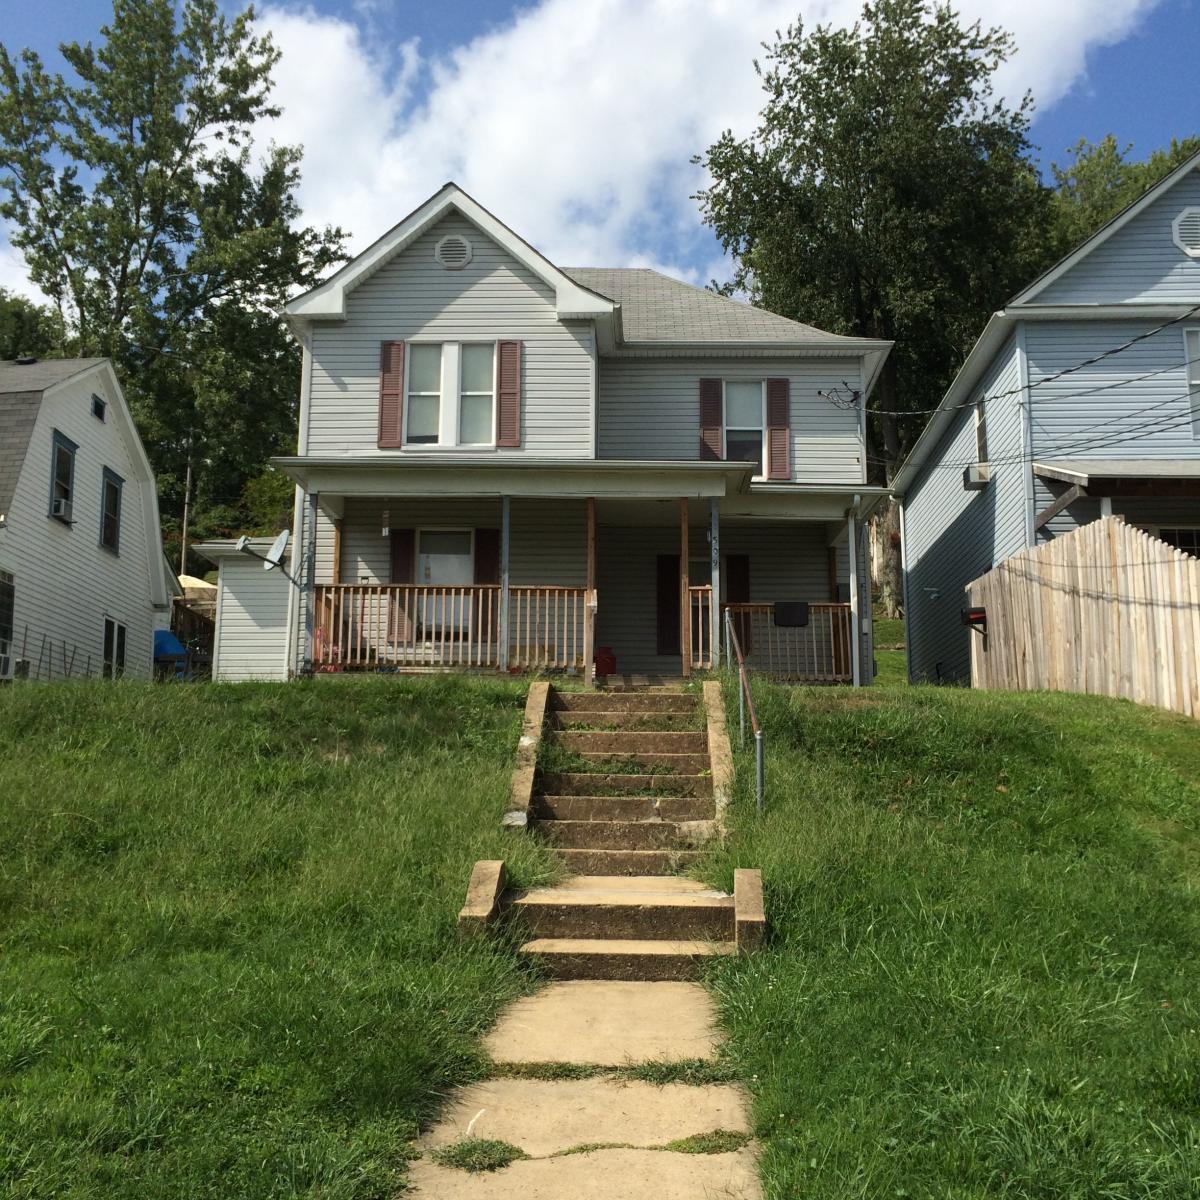 509 View Ave, Fairmont, WV 26554